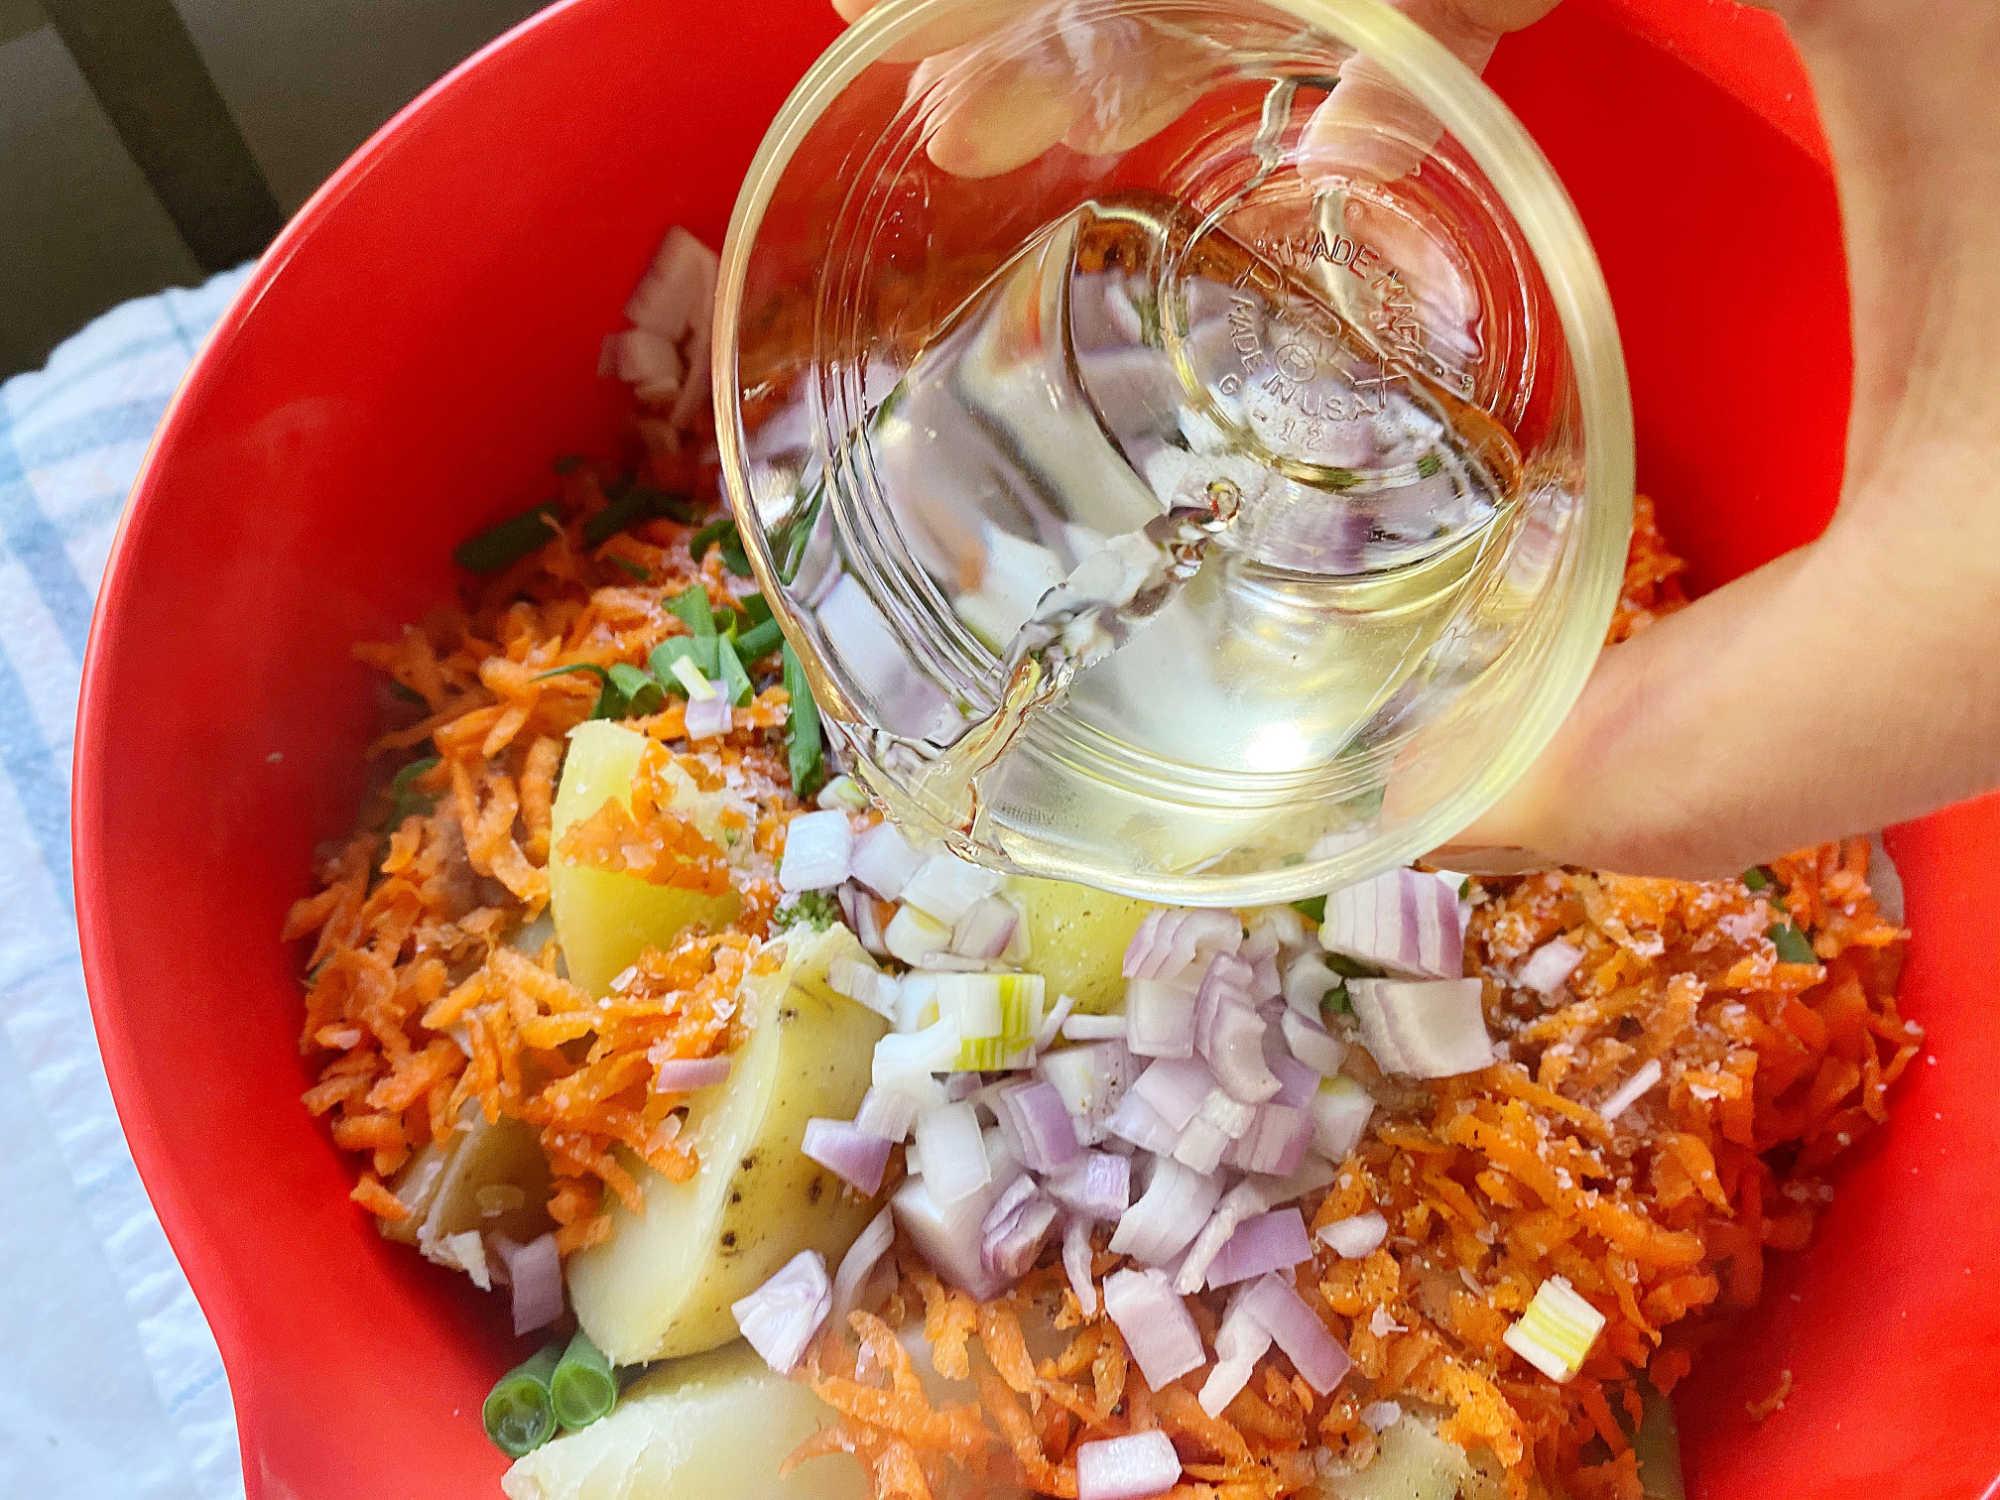 adding white wine vinegar